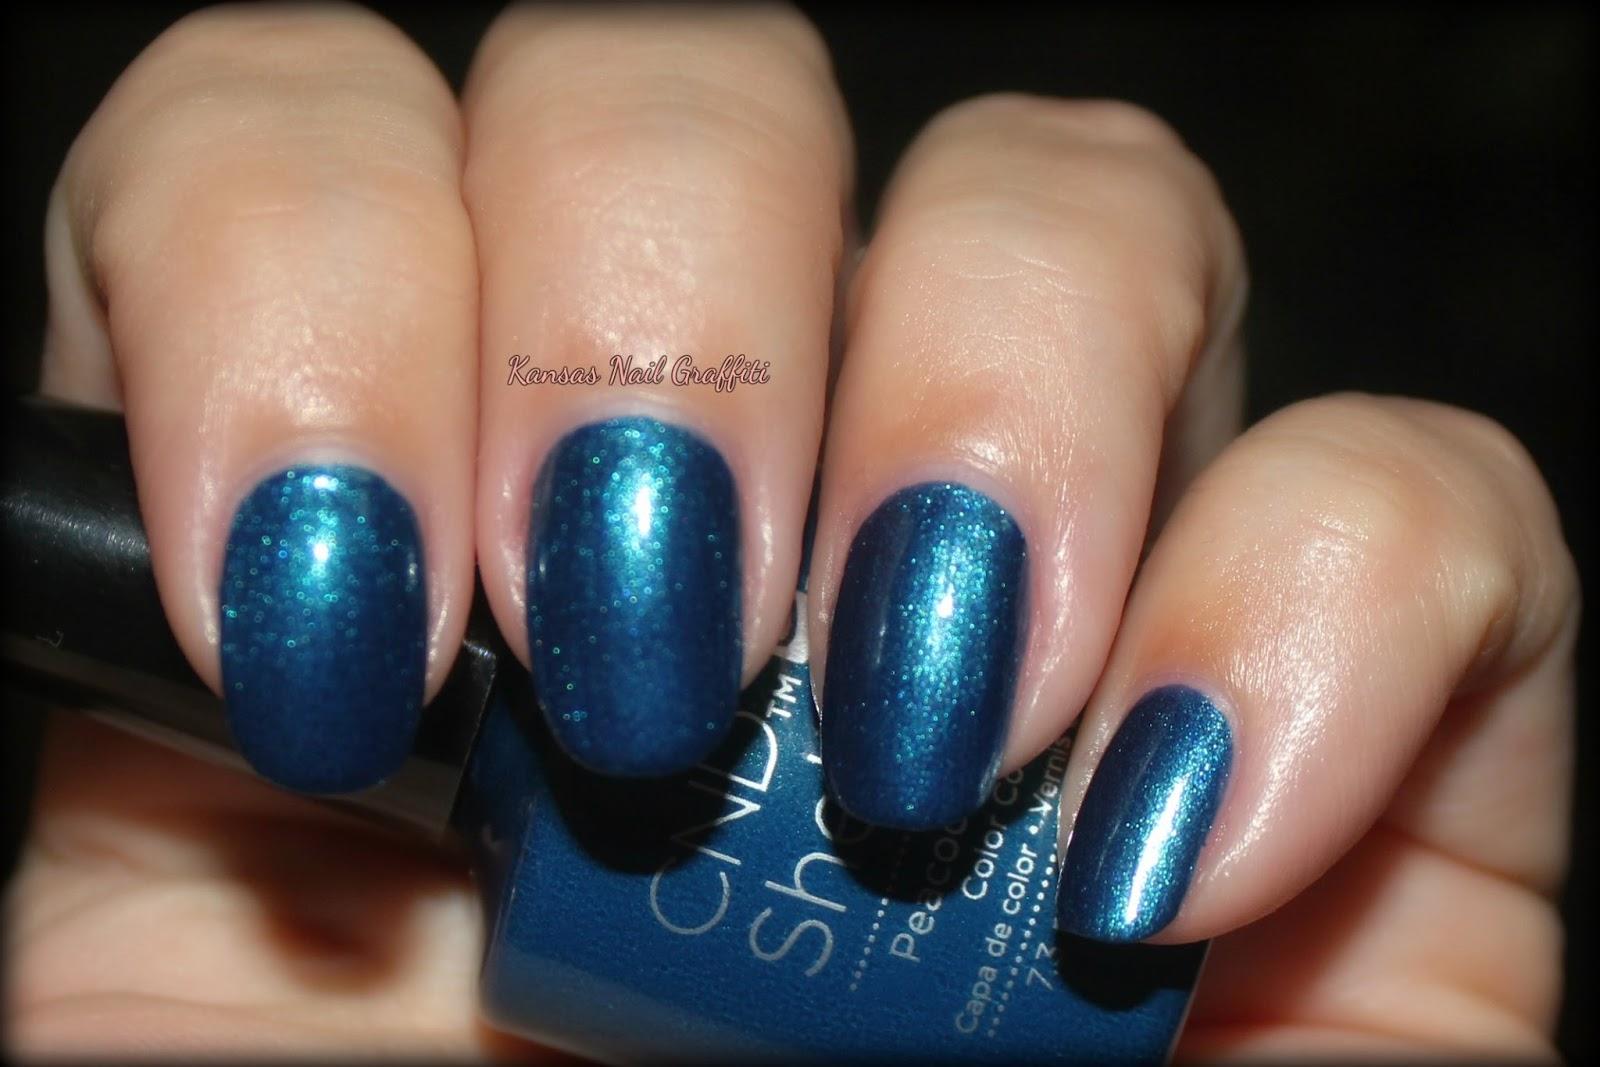 Peacock plume cnd на ногтях